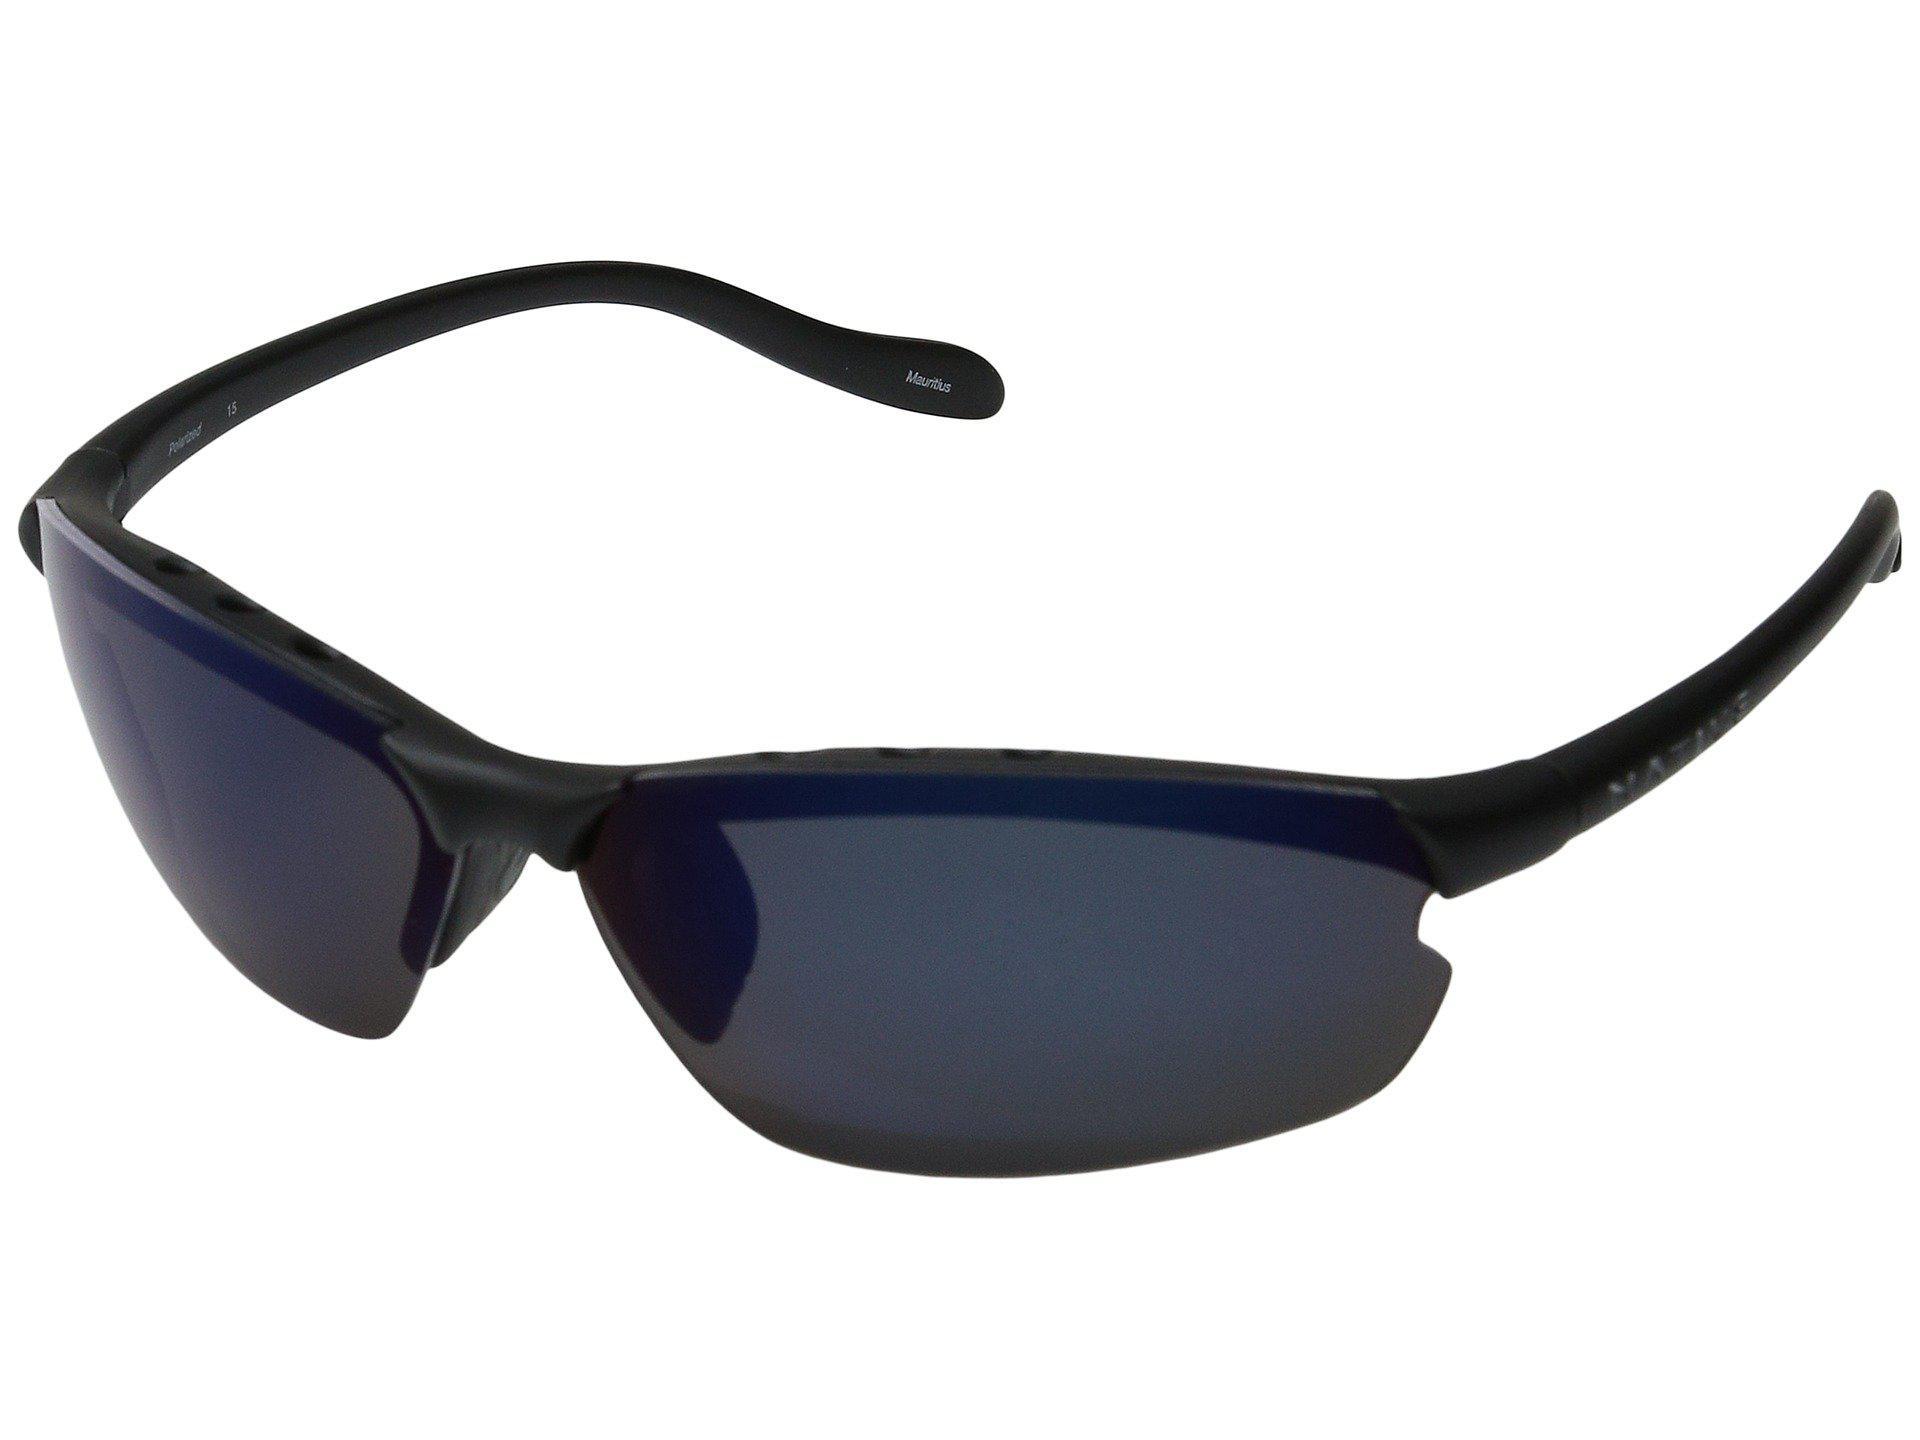 c109bde0e5 Lyst - Native Eyewear Dash Xptm (asphalt blue Reflex (gray) Lens ...